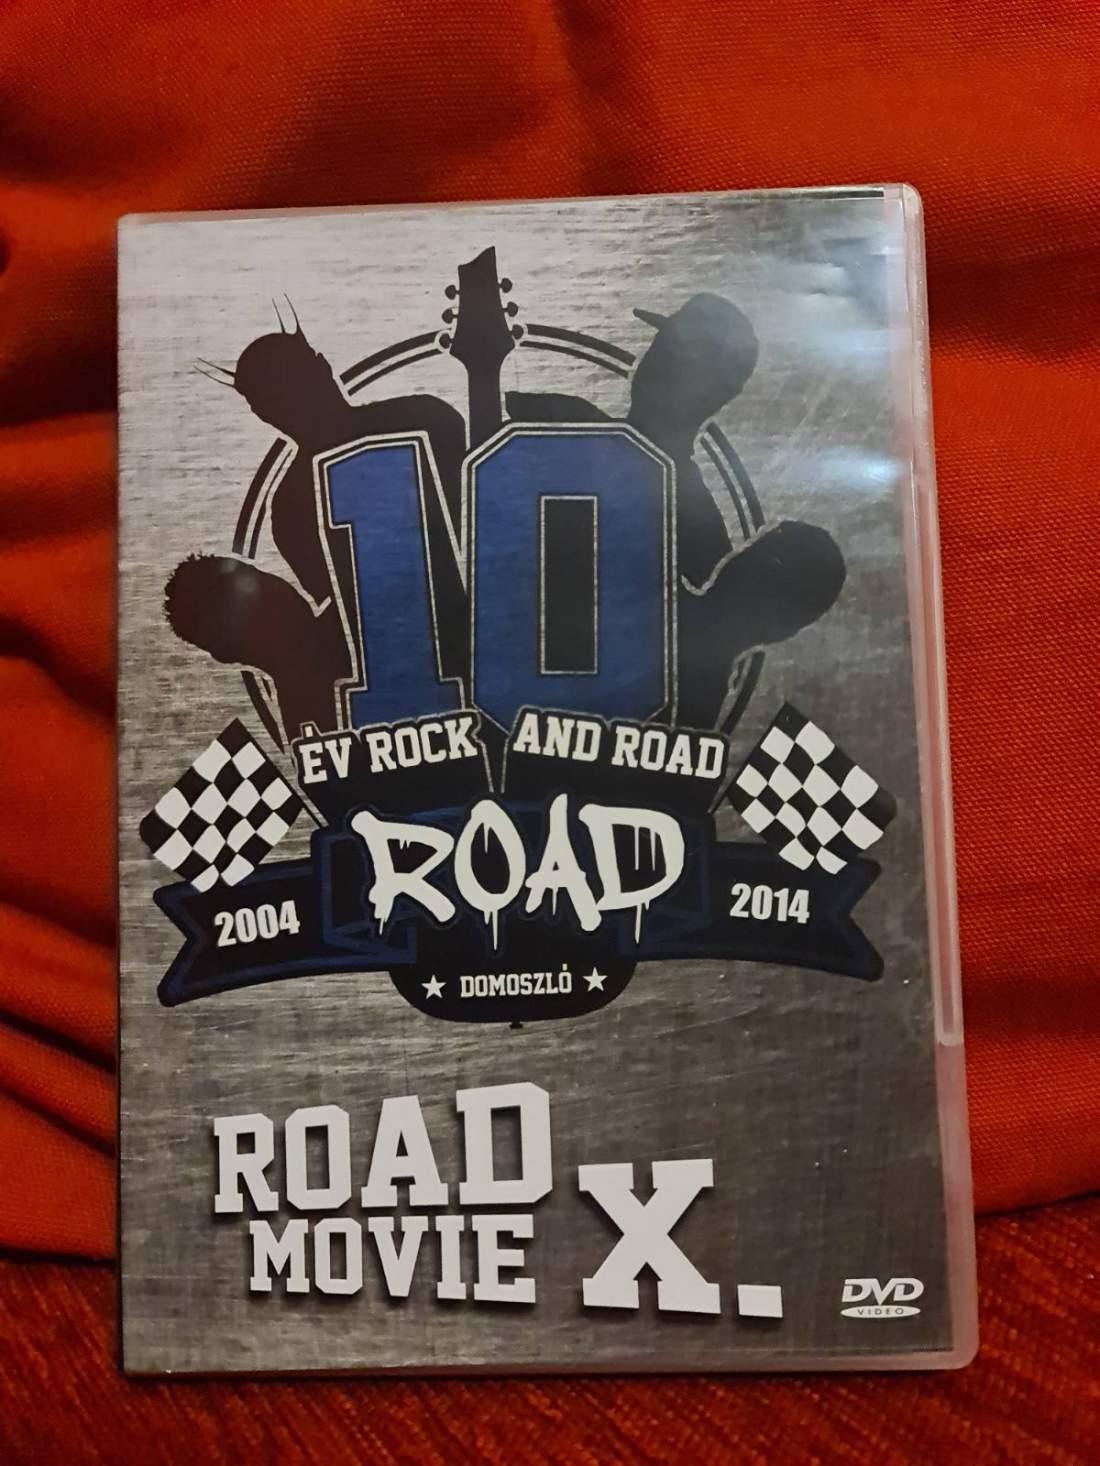 ROAD - ROAD MOVIE X DVD